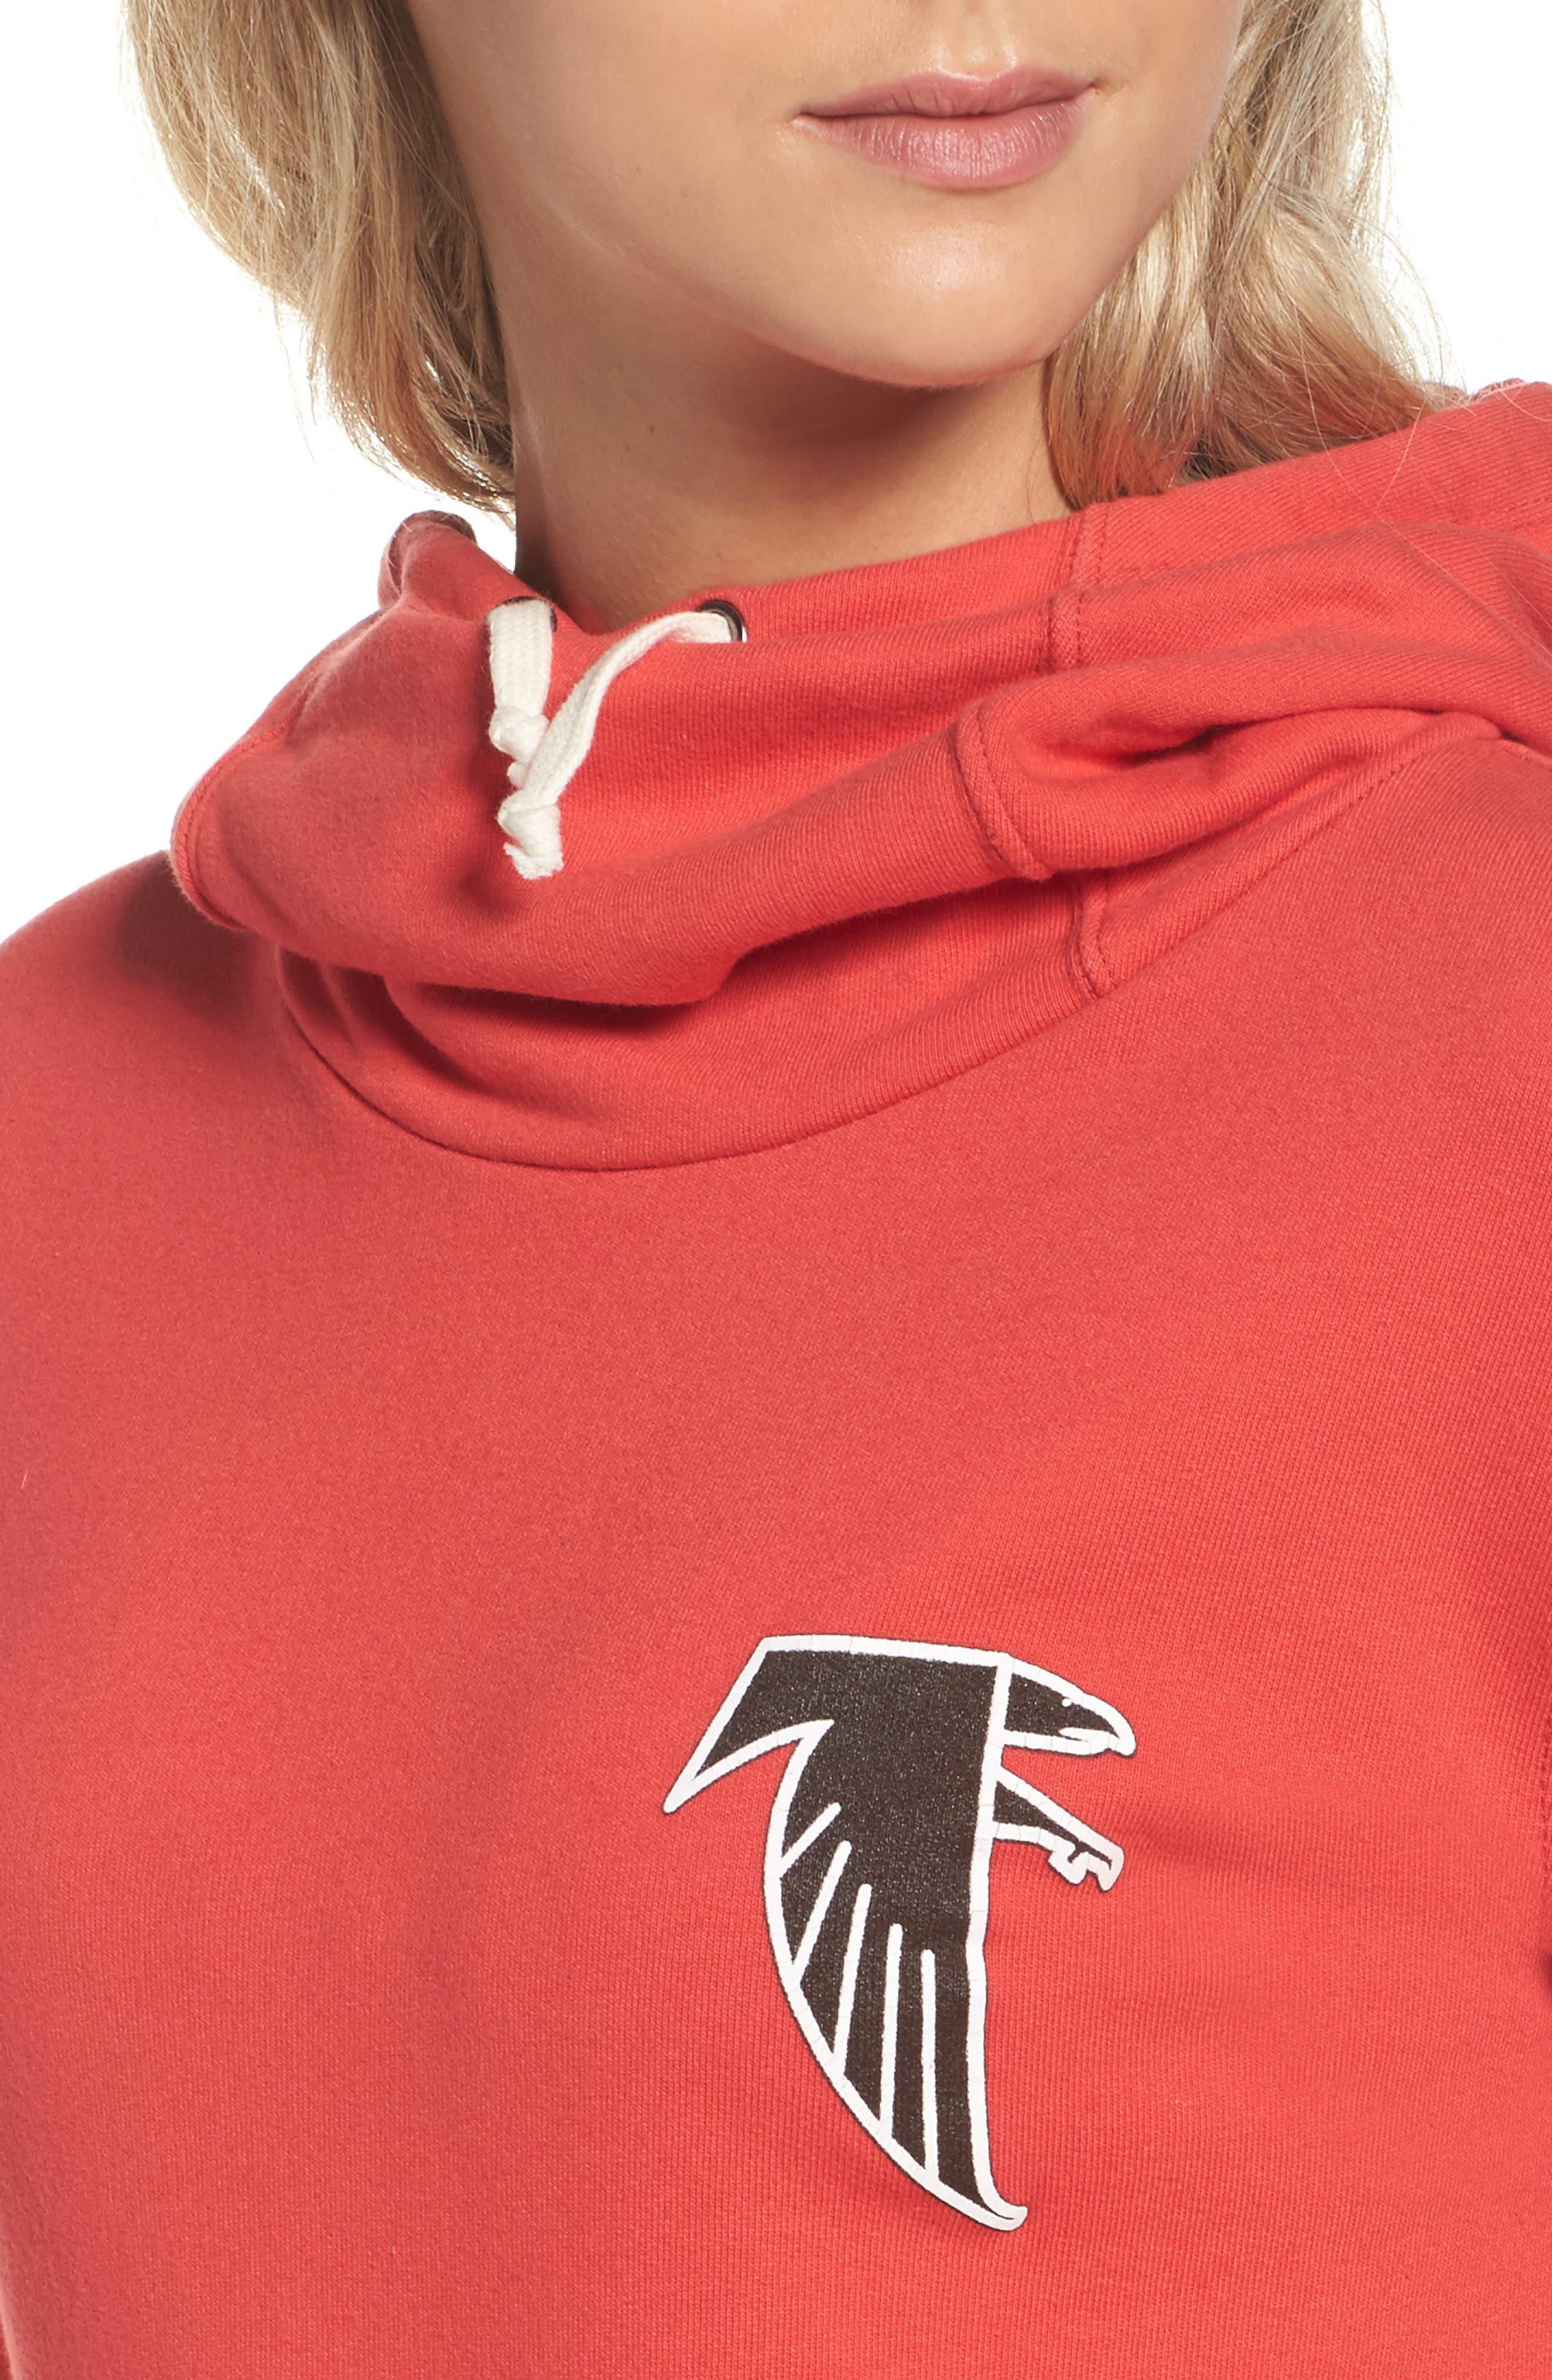 NFL Atlanta Falcons Sunday Hoodie,                             Alternate thumbnail 4, color,                             622